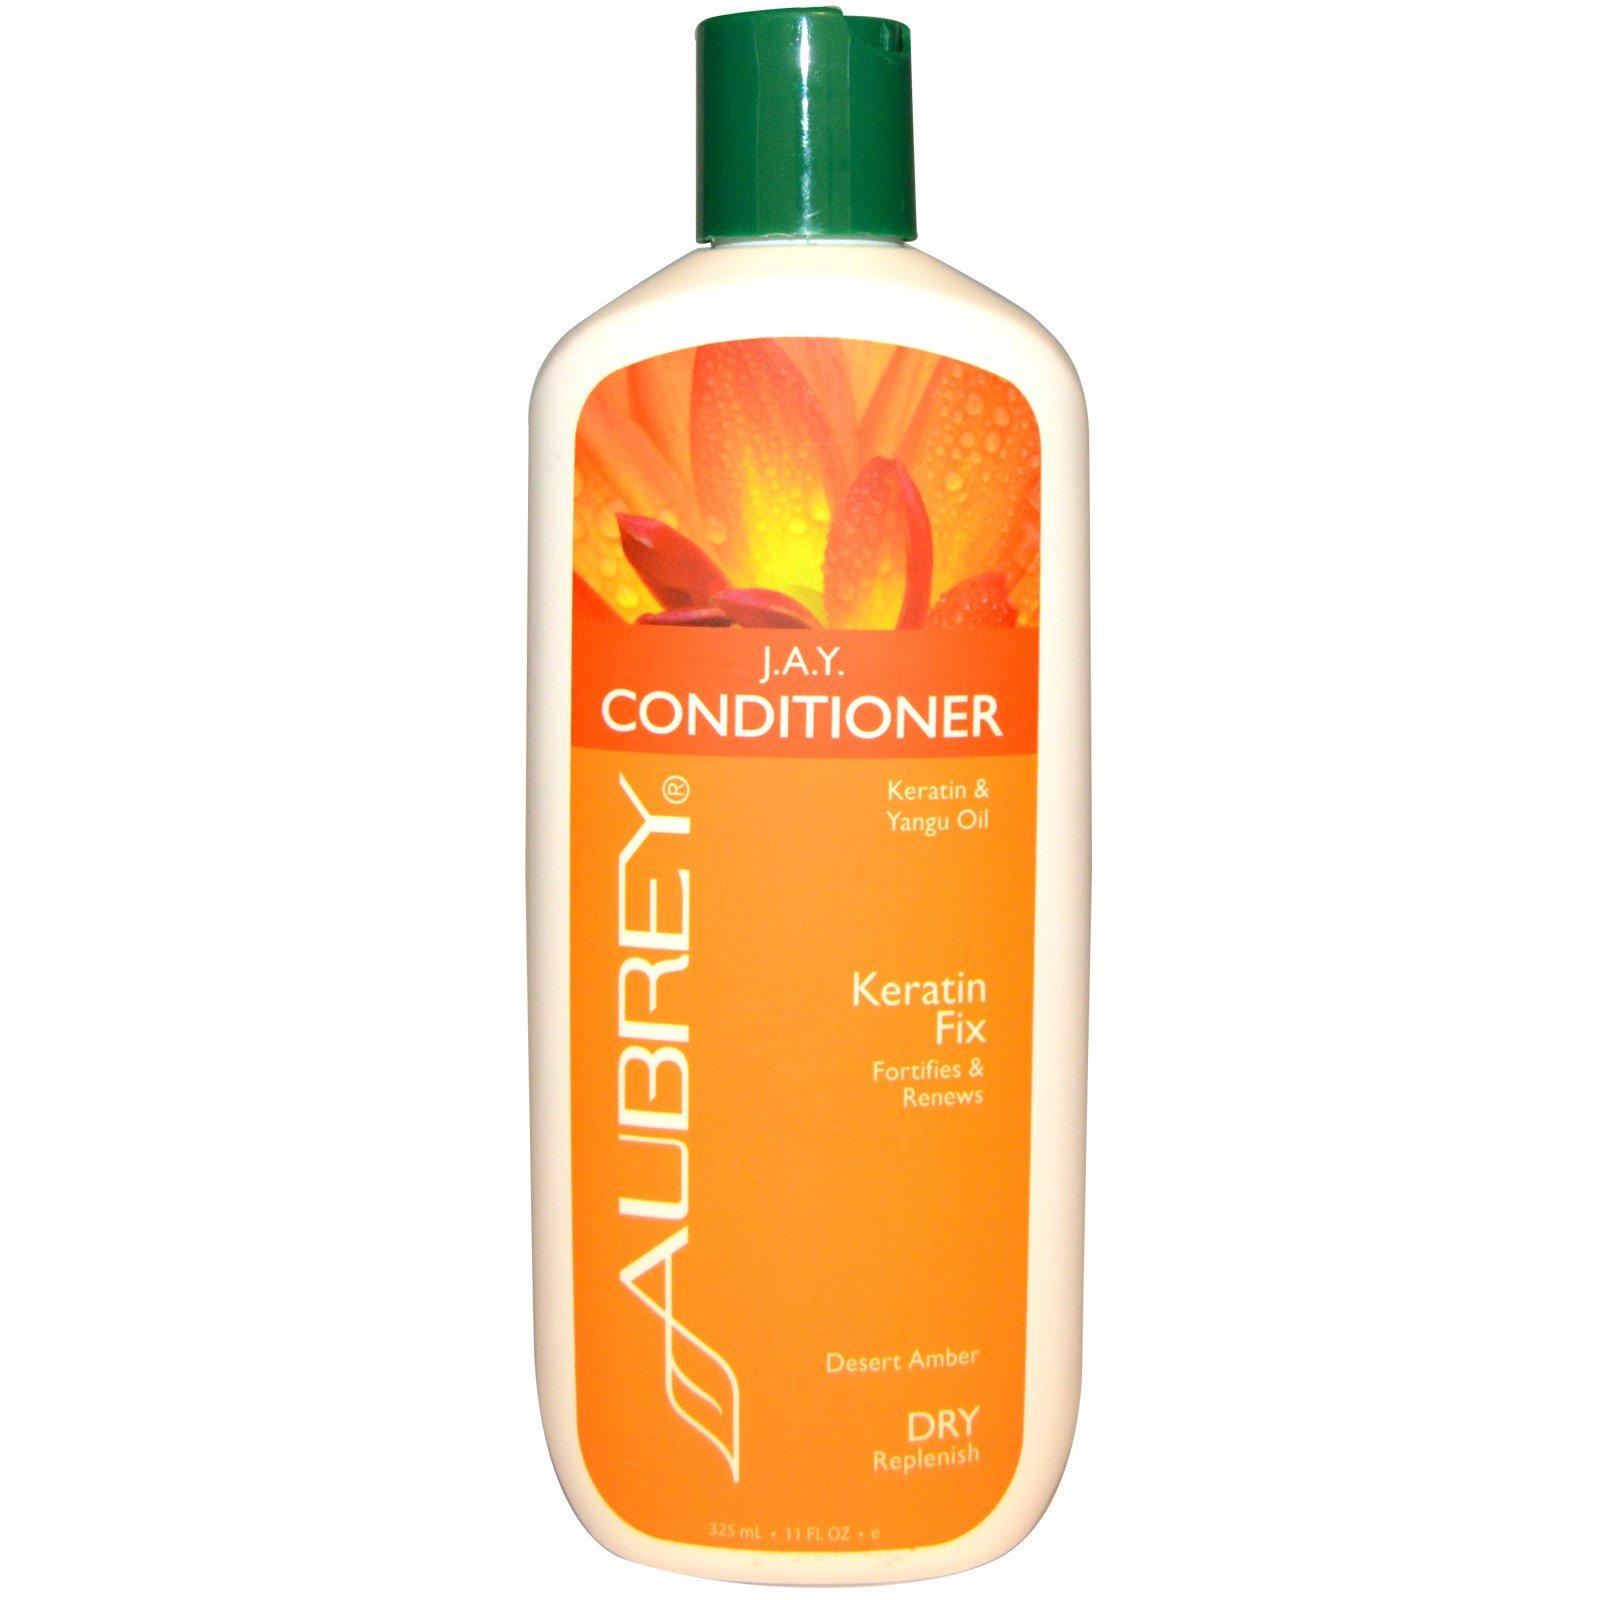 Aubrey Organics, J.A.Y. Conditioner, Dry Hair, Citrus Clove, 11 fl oz (325 ml)